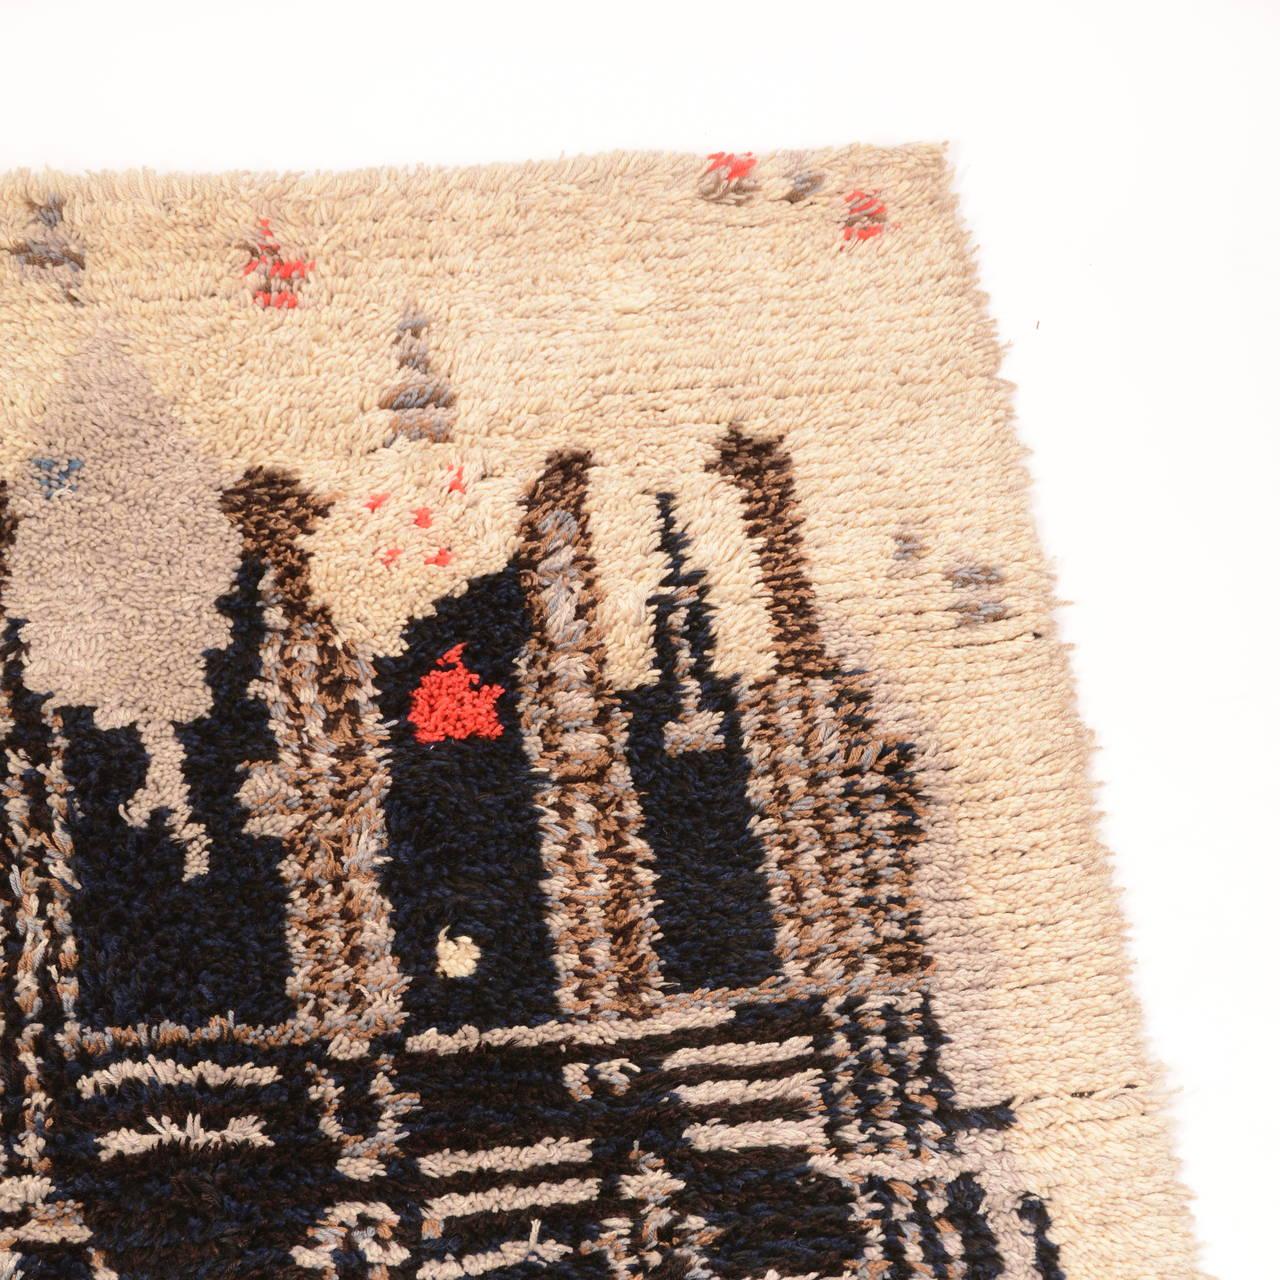 Mid-20th Century Midcentury Scandinavian Modern Rya Wool Rug Wall Hanging For Sale